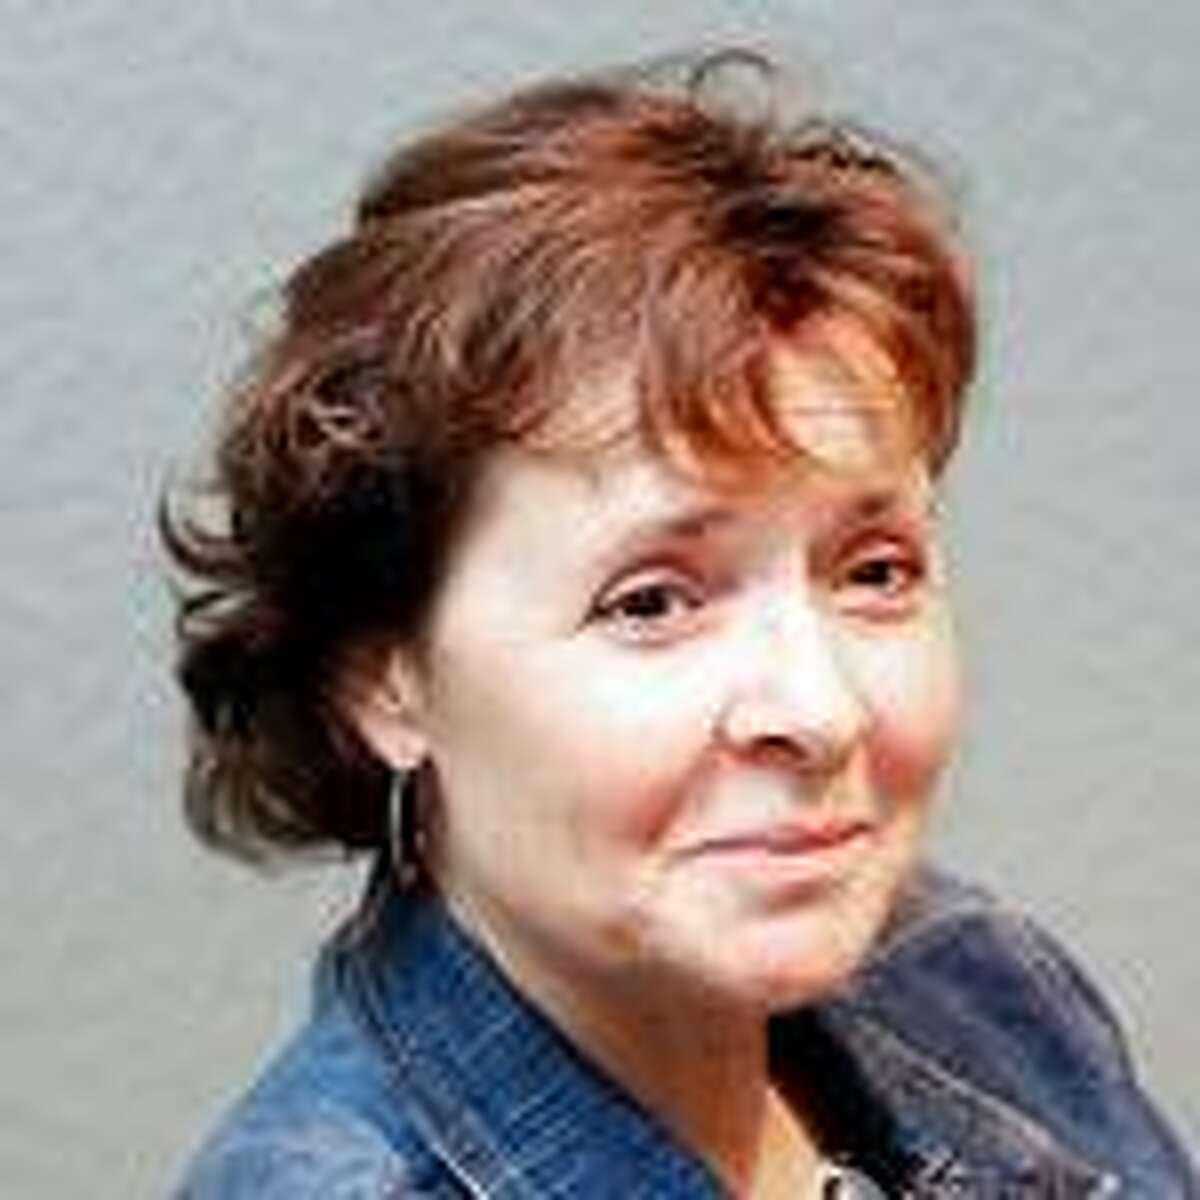 Cheri Quickmire, executive director of Common Cause in Connecticut